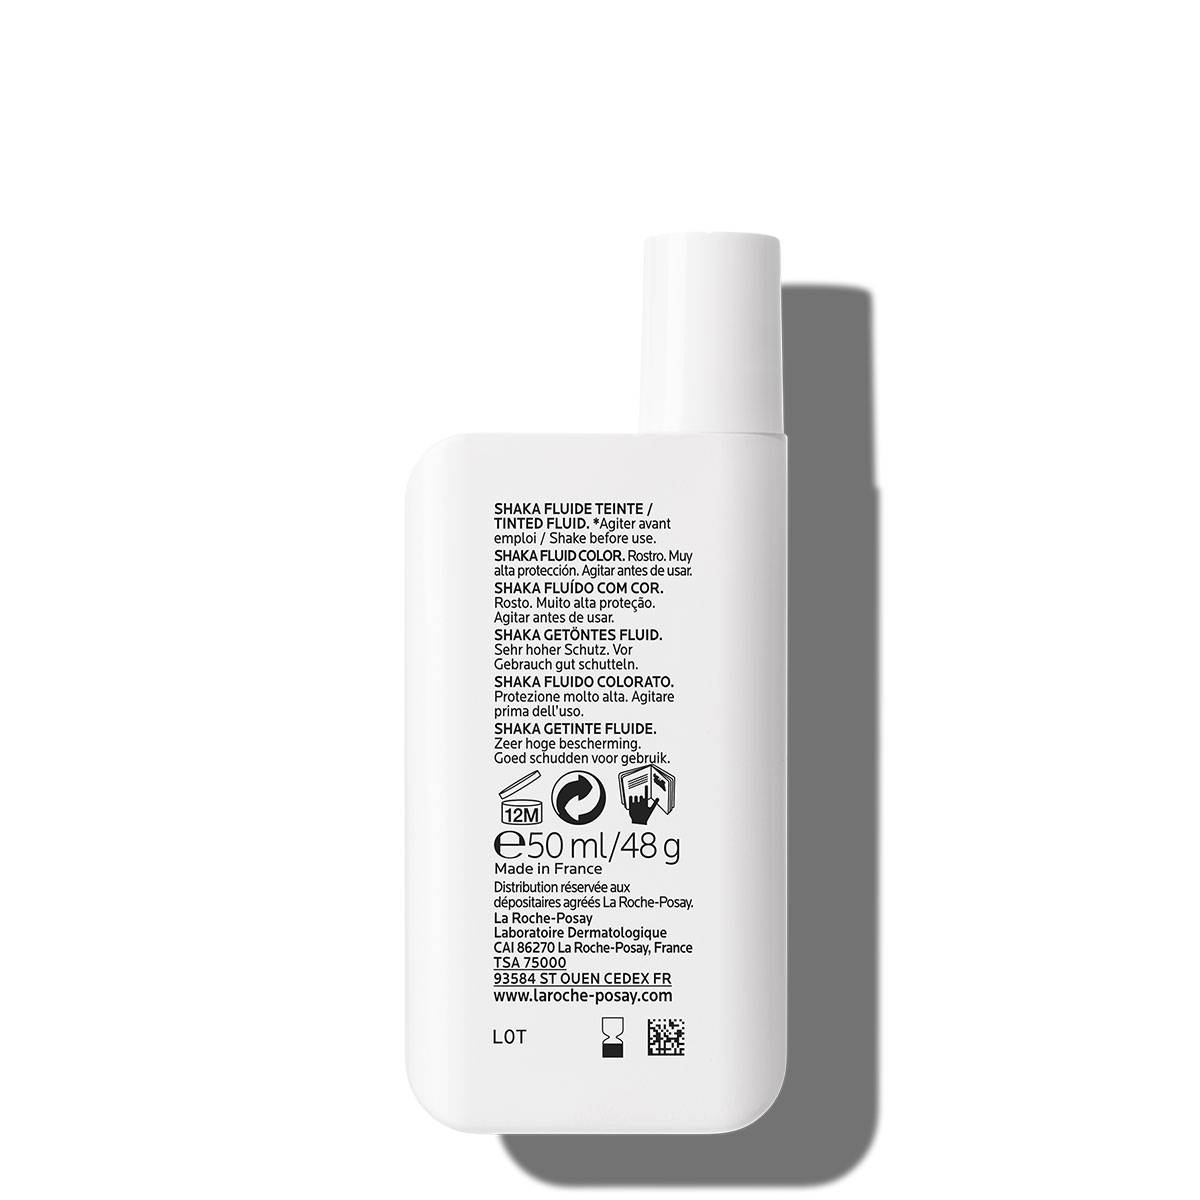 La Roche Posay ProductPage Sun Anthelios Shaka Fluid Spf50 50ml 301626